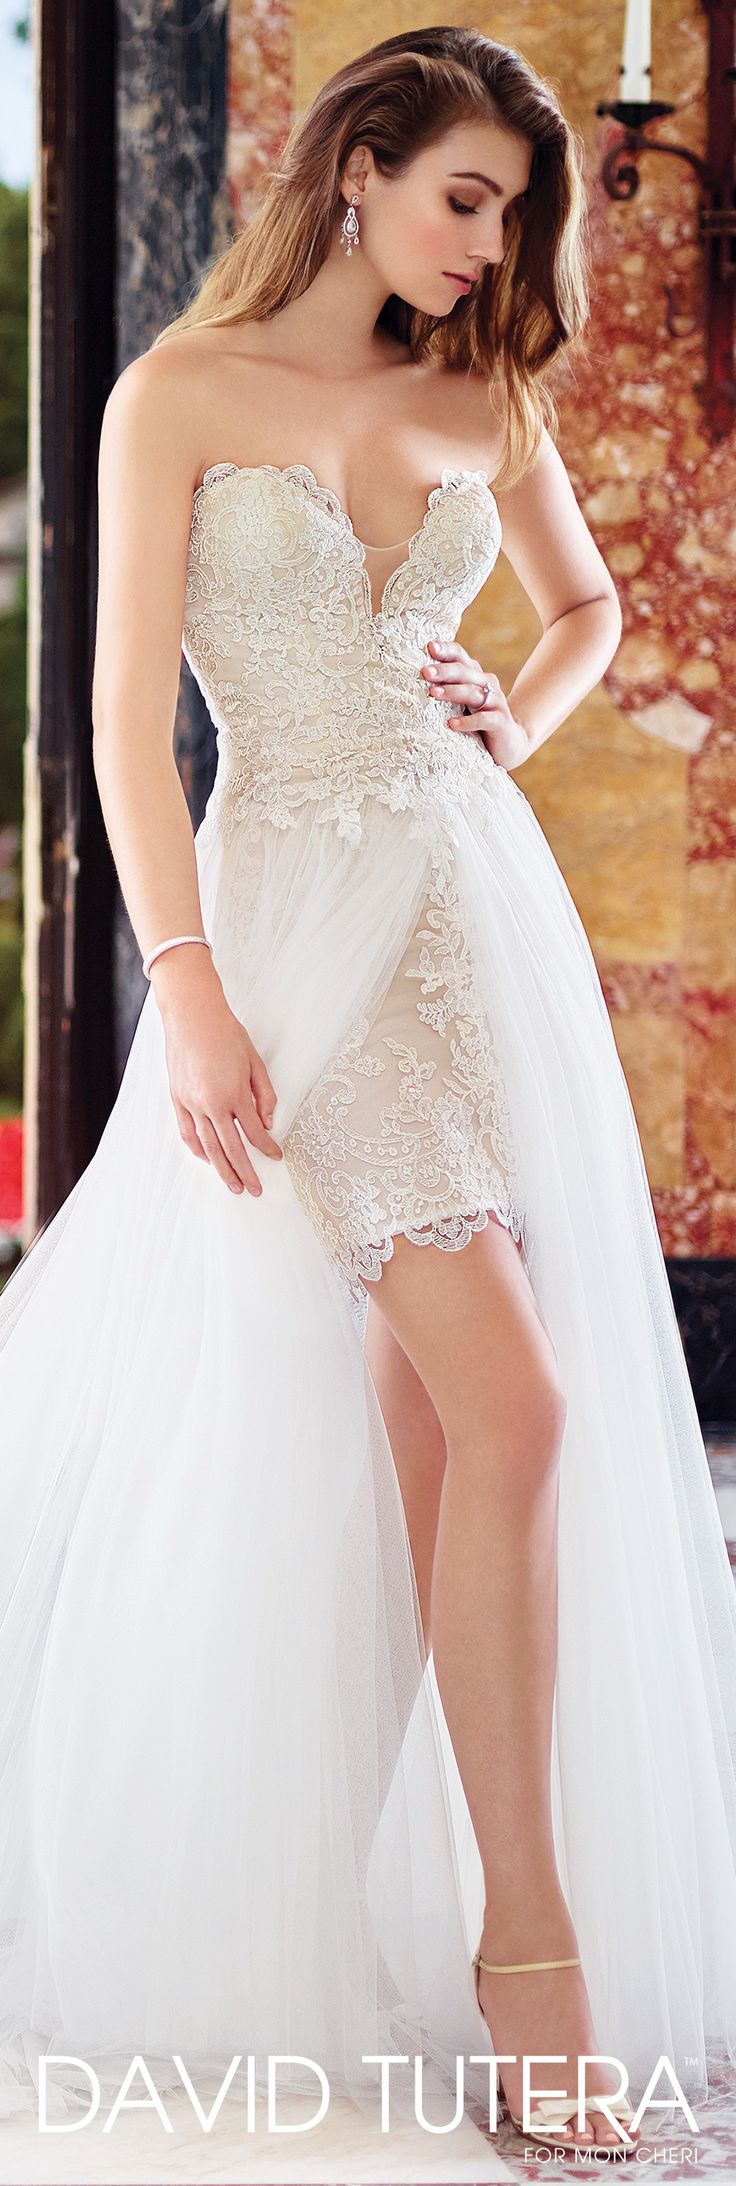 David Tutera for Mon Cheri - 117265 Lyra - Two-piece wedding dress set. Love this unique piece!